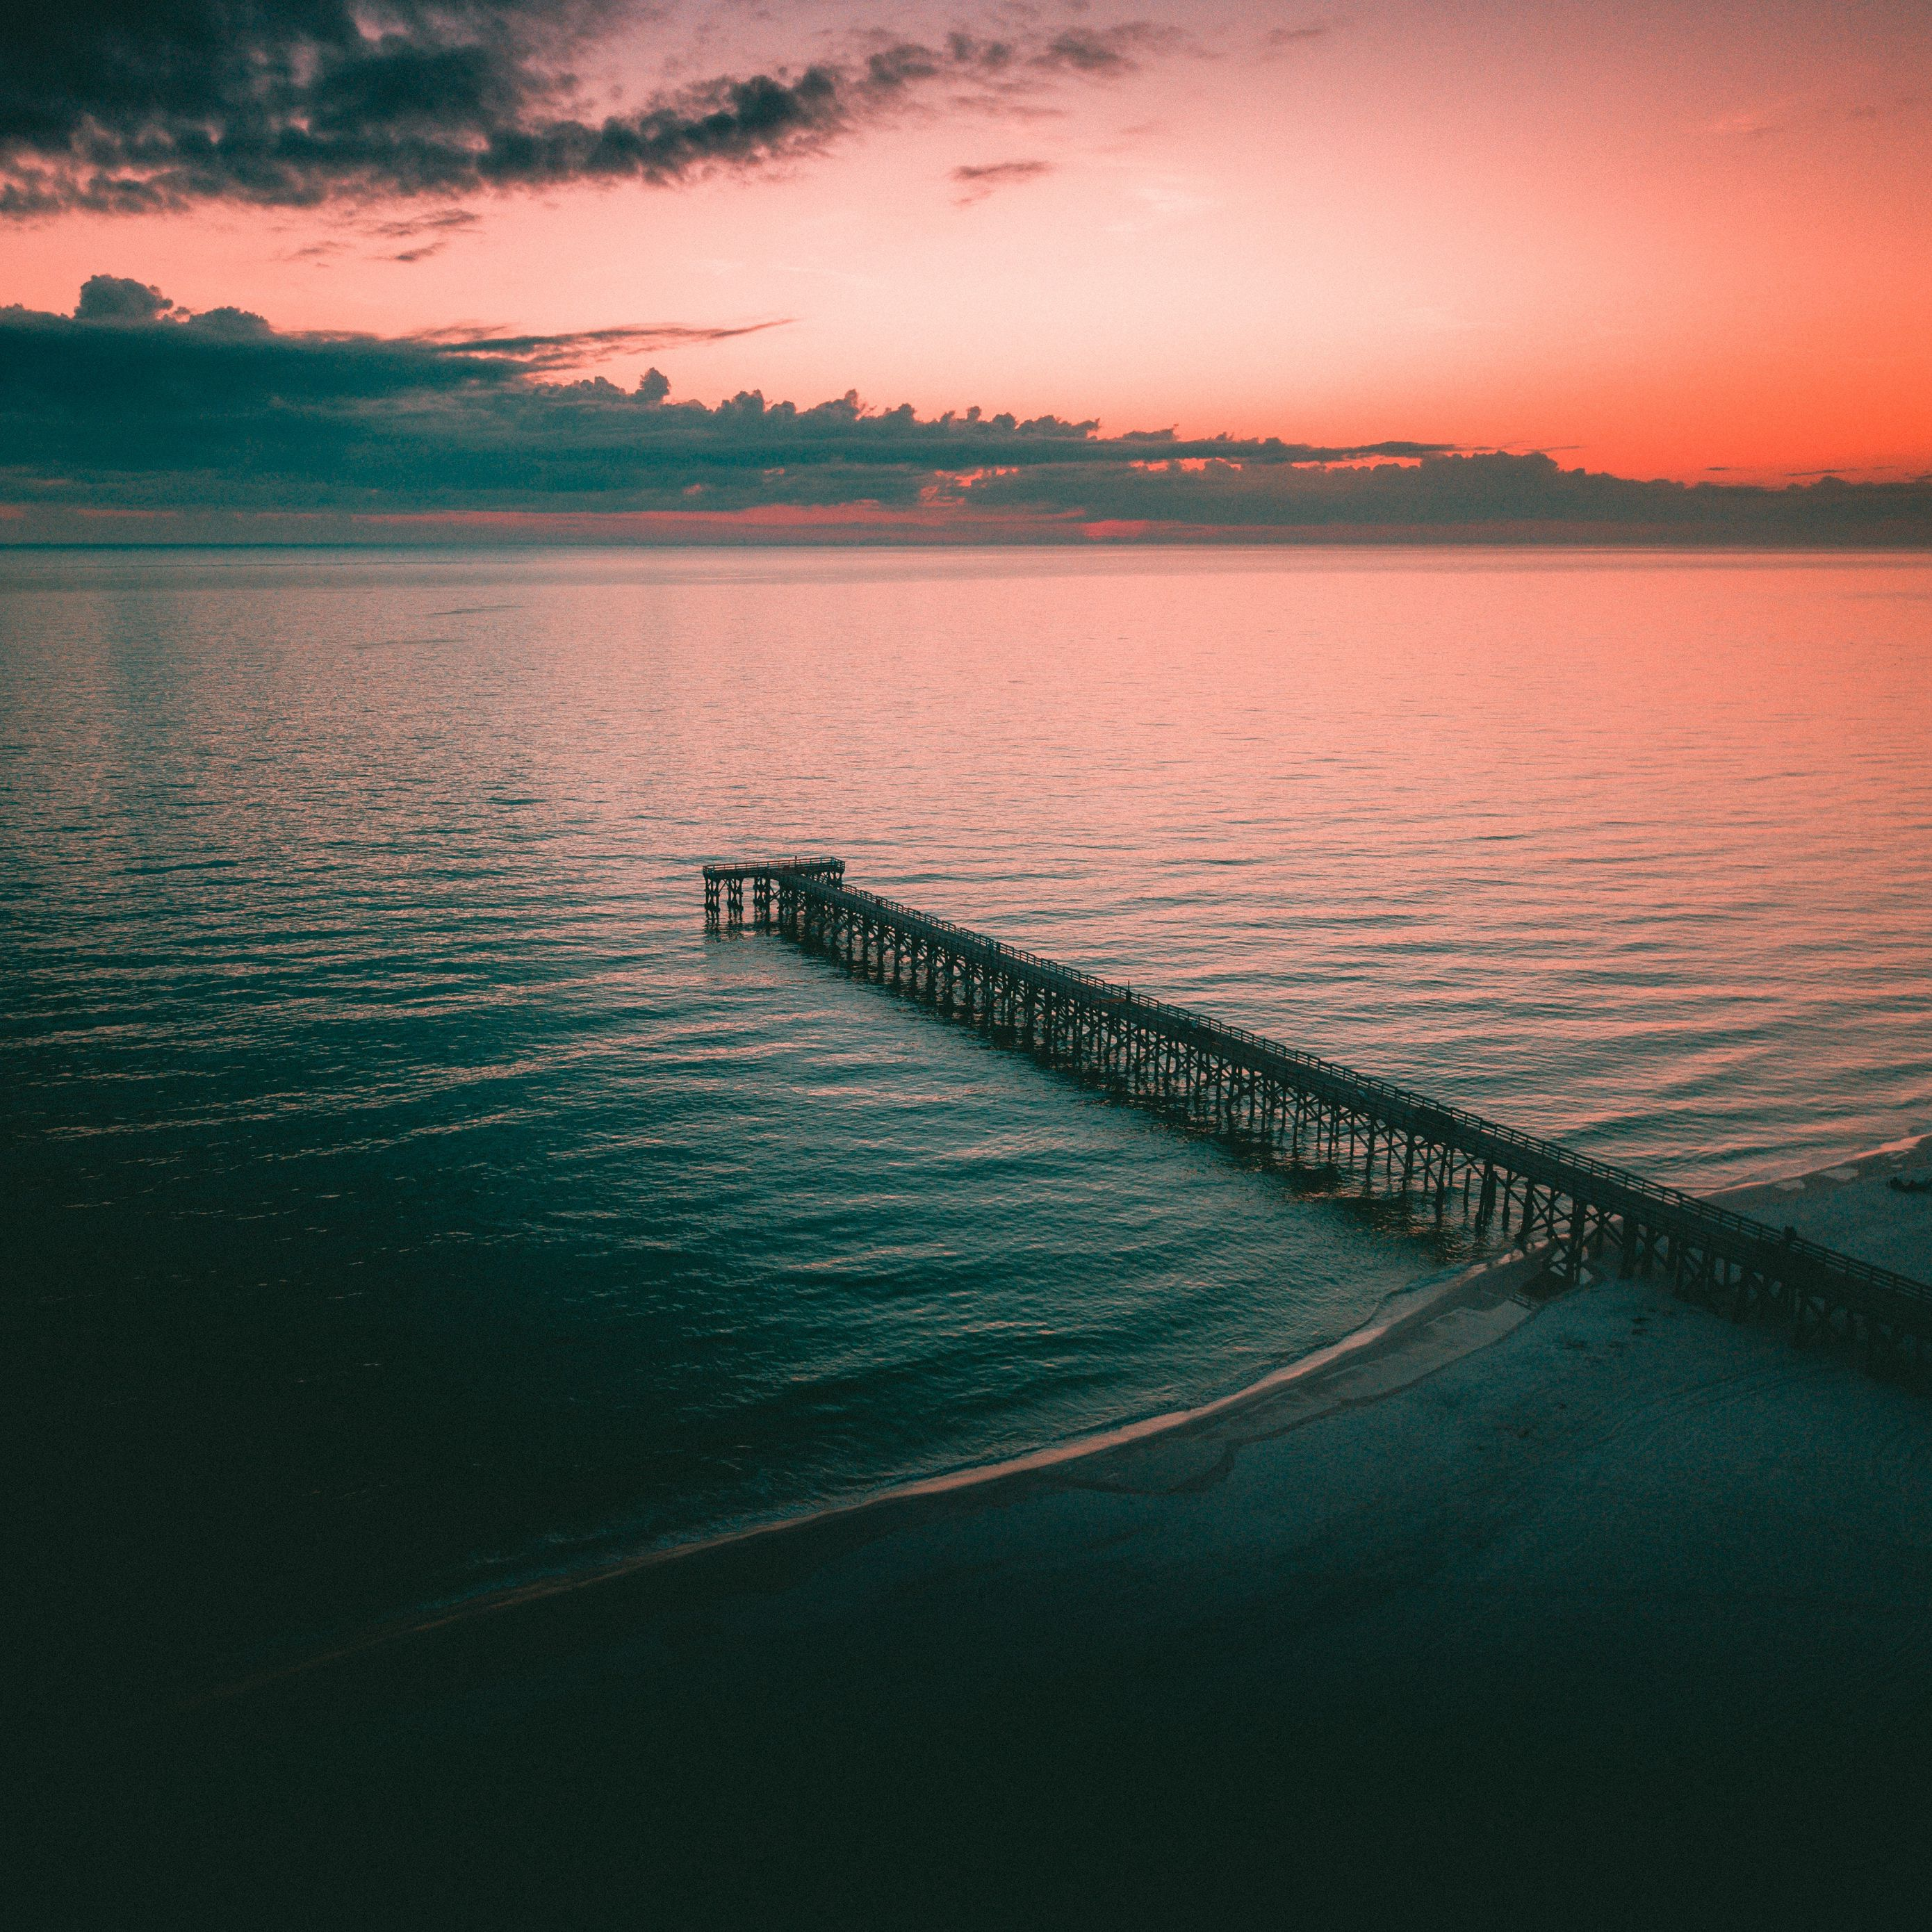 2780x2780 Wallpaper pier, dock, sea, dusk, shore